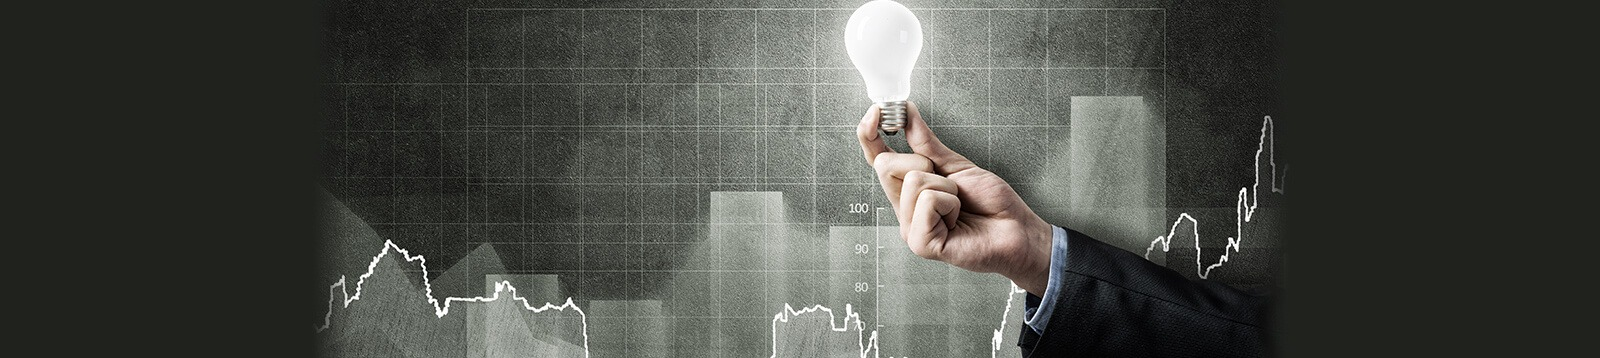 Business Customer Education